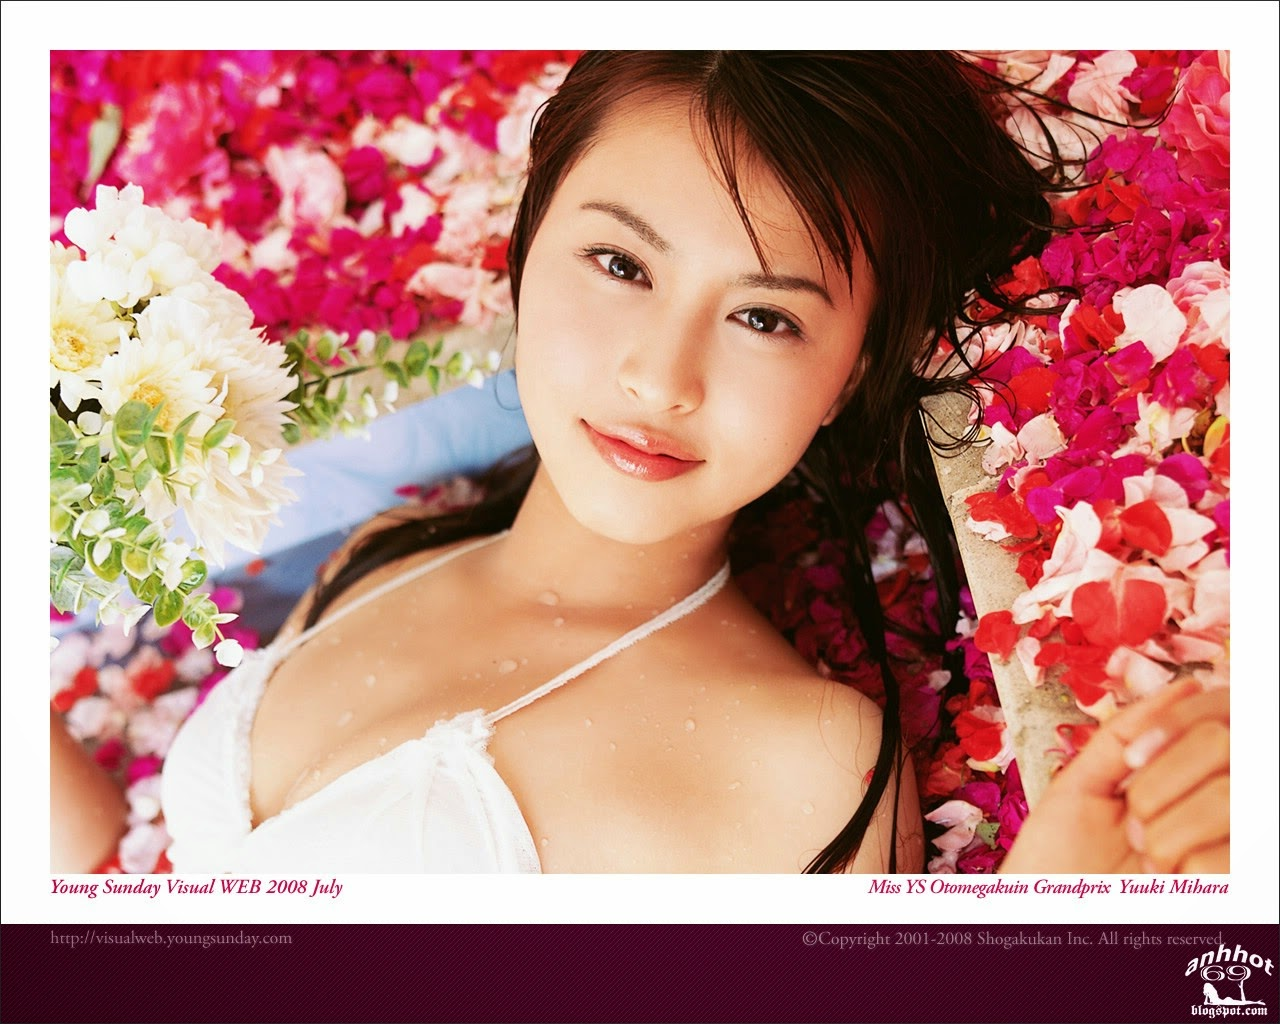 yuuki-mihara-02774903